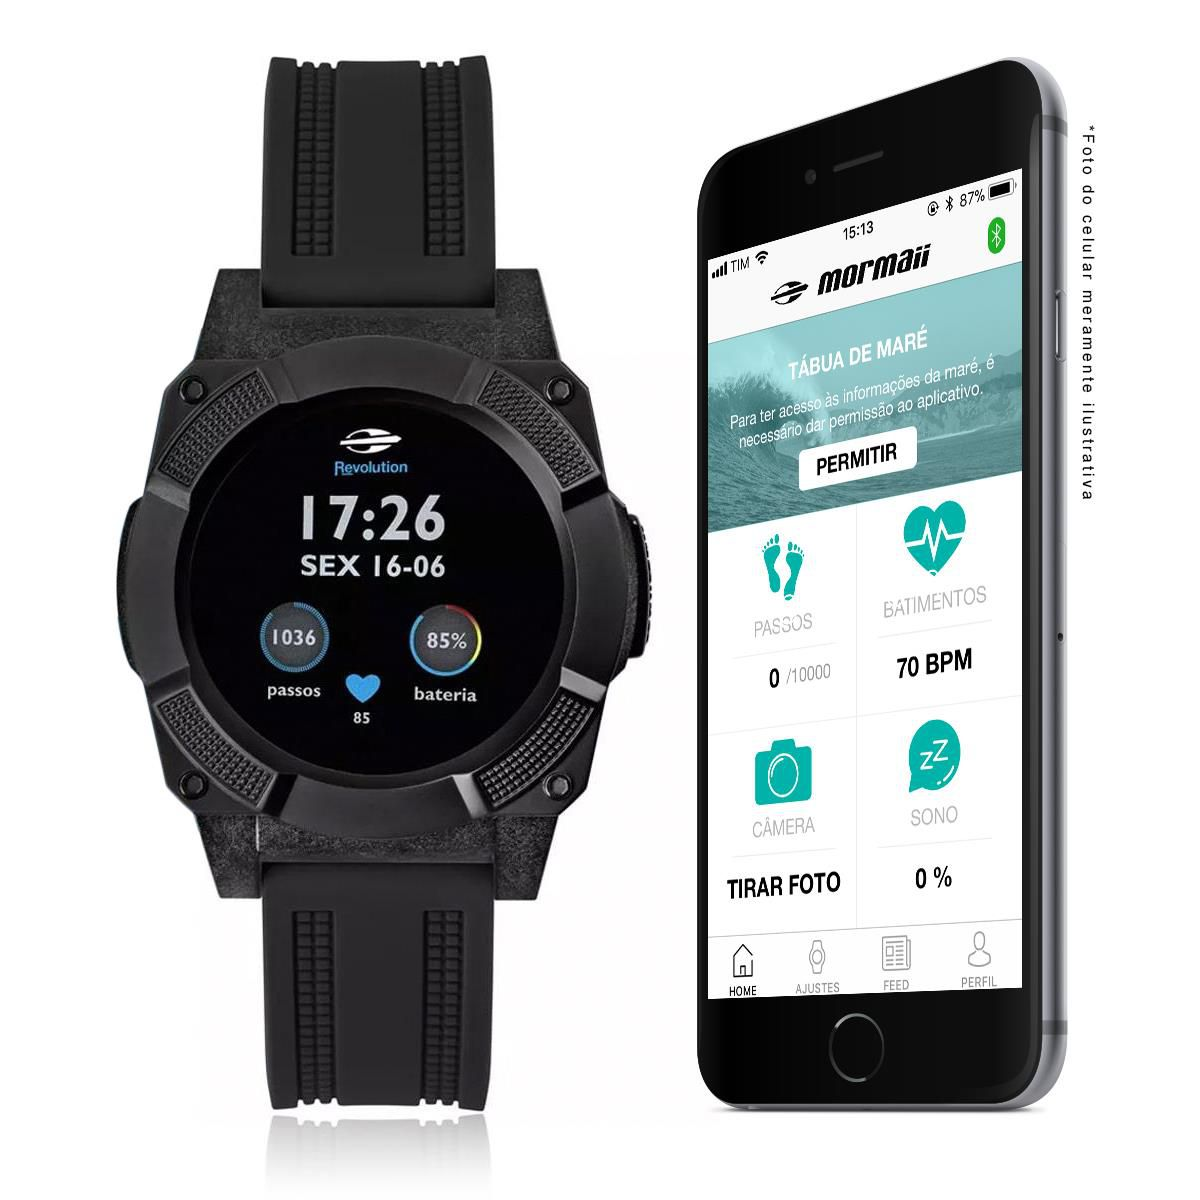 08eeb63e4f9 Relógio Smartwatch Revolution Mormaii Masculino MOSRAB 8P - Relógios ...